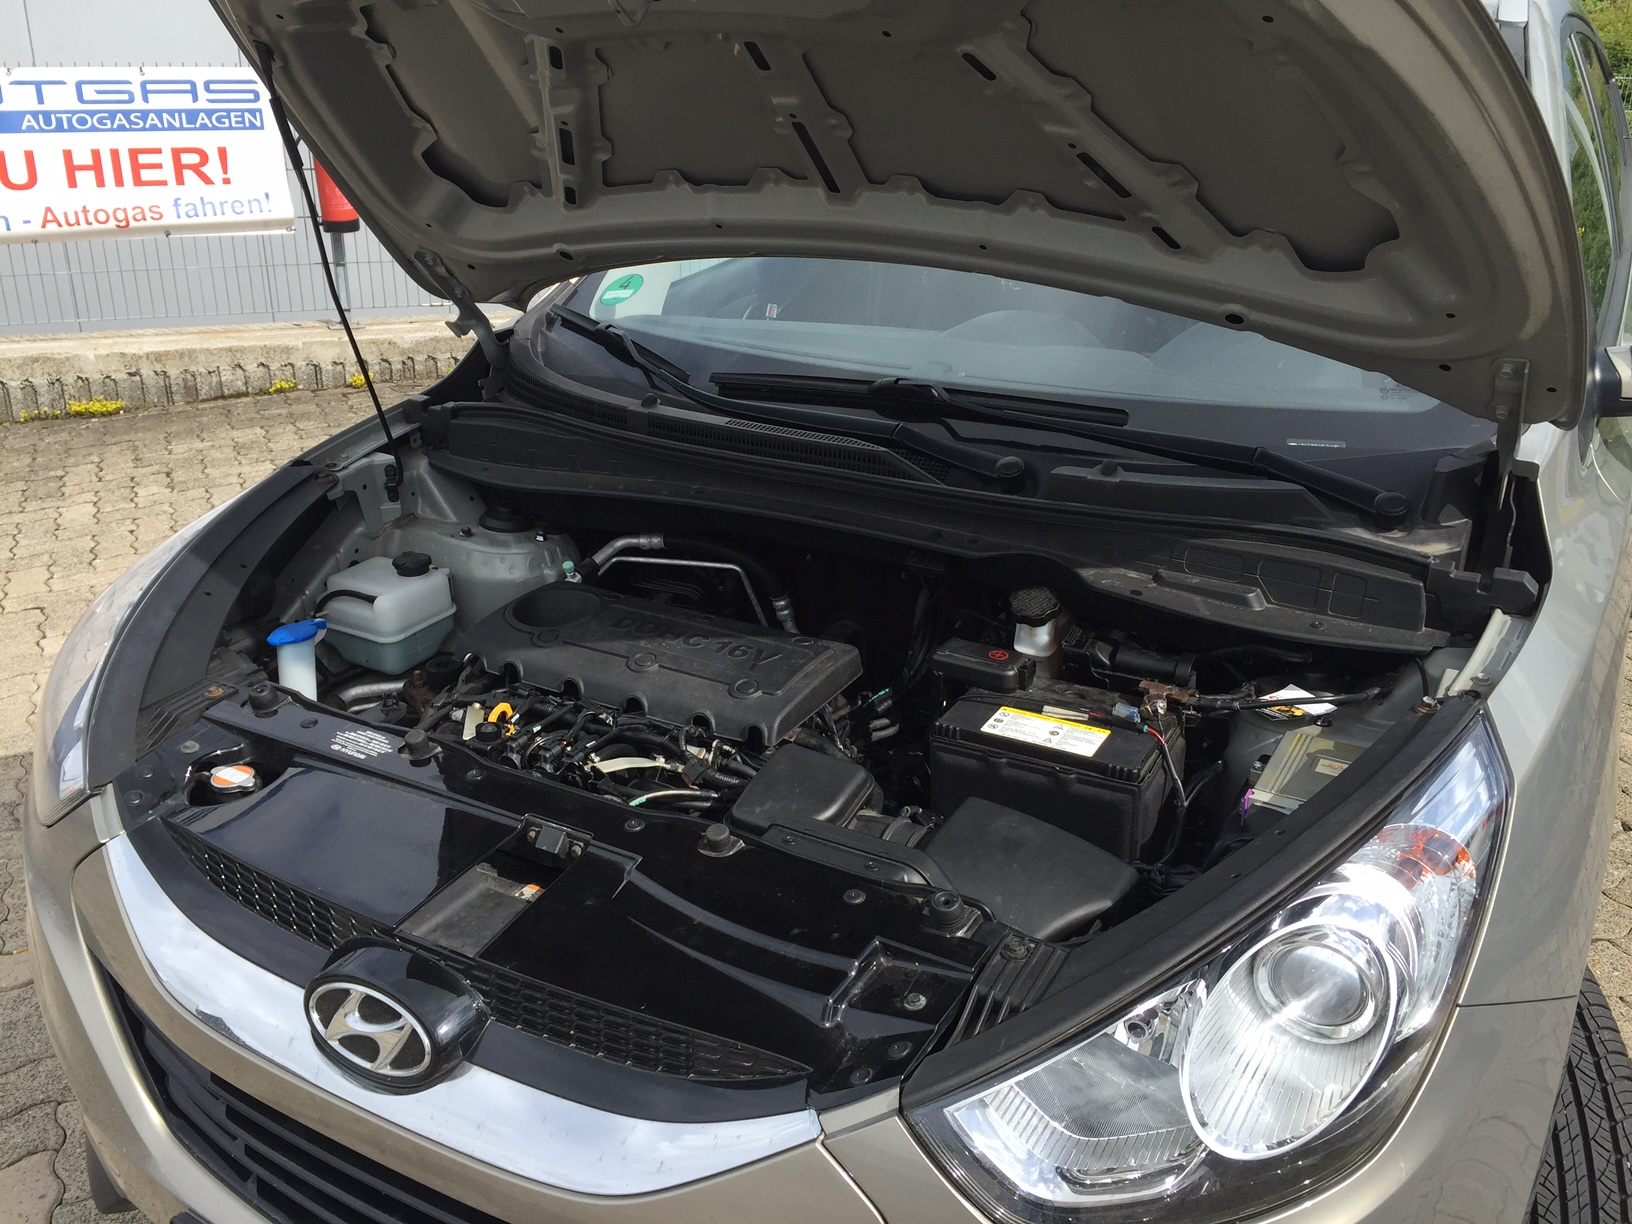 autogas_umruesstung-auf-lpg-autogas-hyundai-ix-35-16v-motor